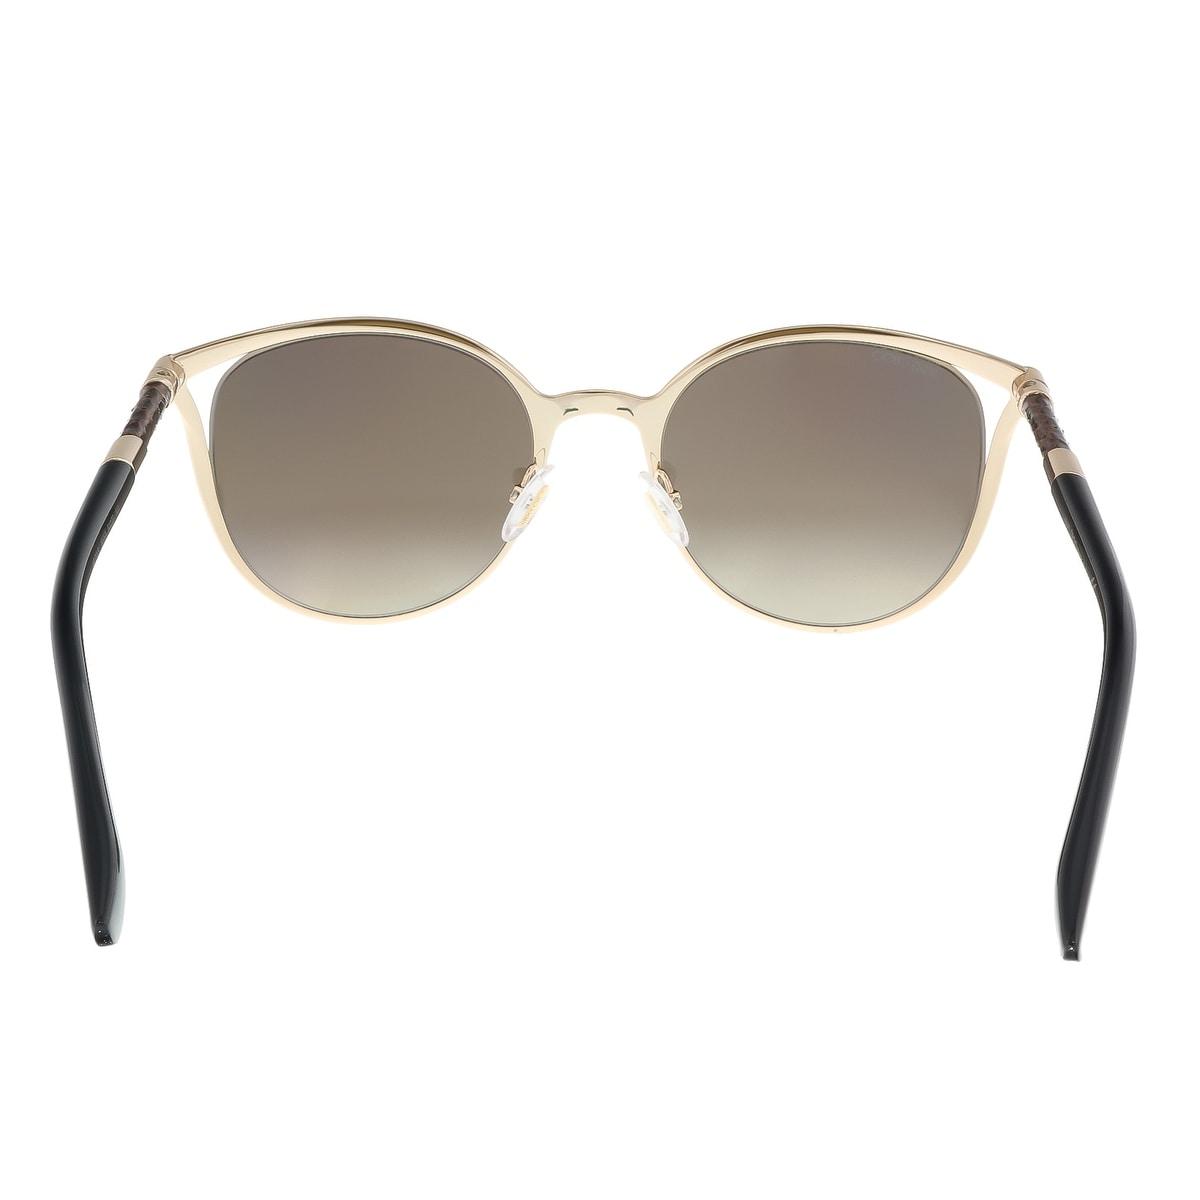 178d81cab33 Shop Jimmy Choo Neiza S 0J6H Matte Black Cateye Sunglasses - 54-20-140 -  Free Shipping Today - Overstock - 16801576